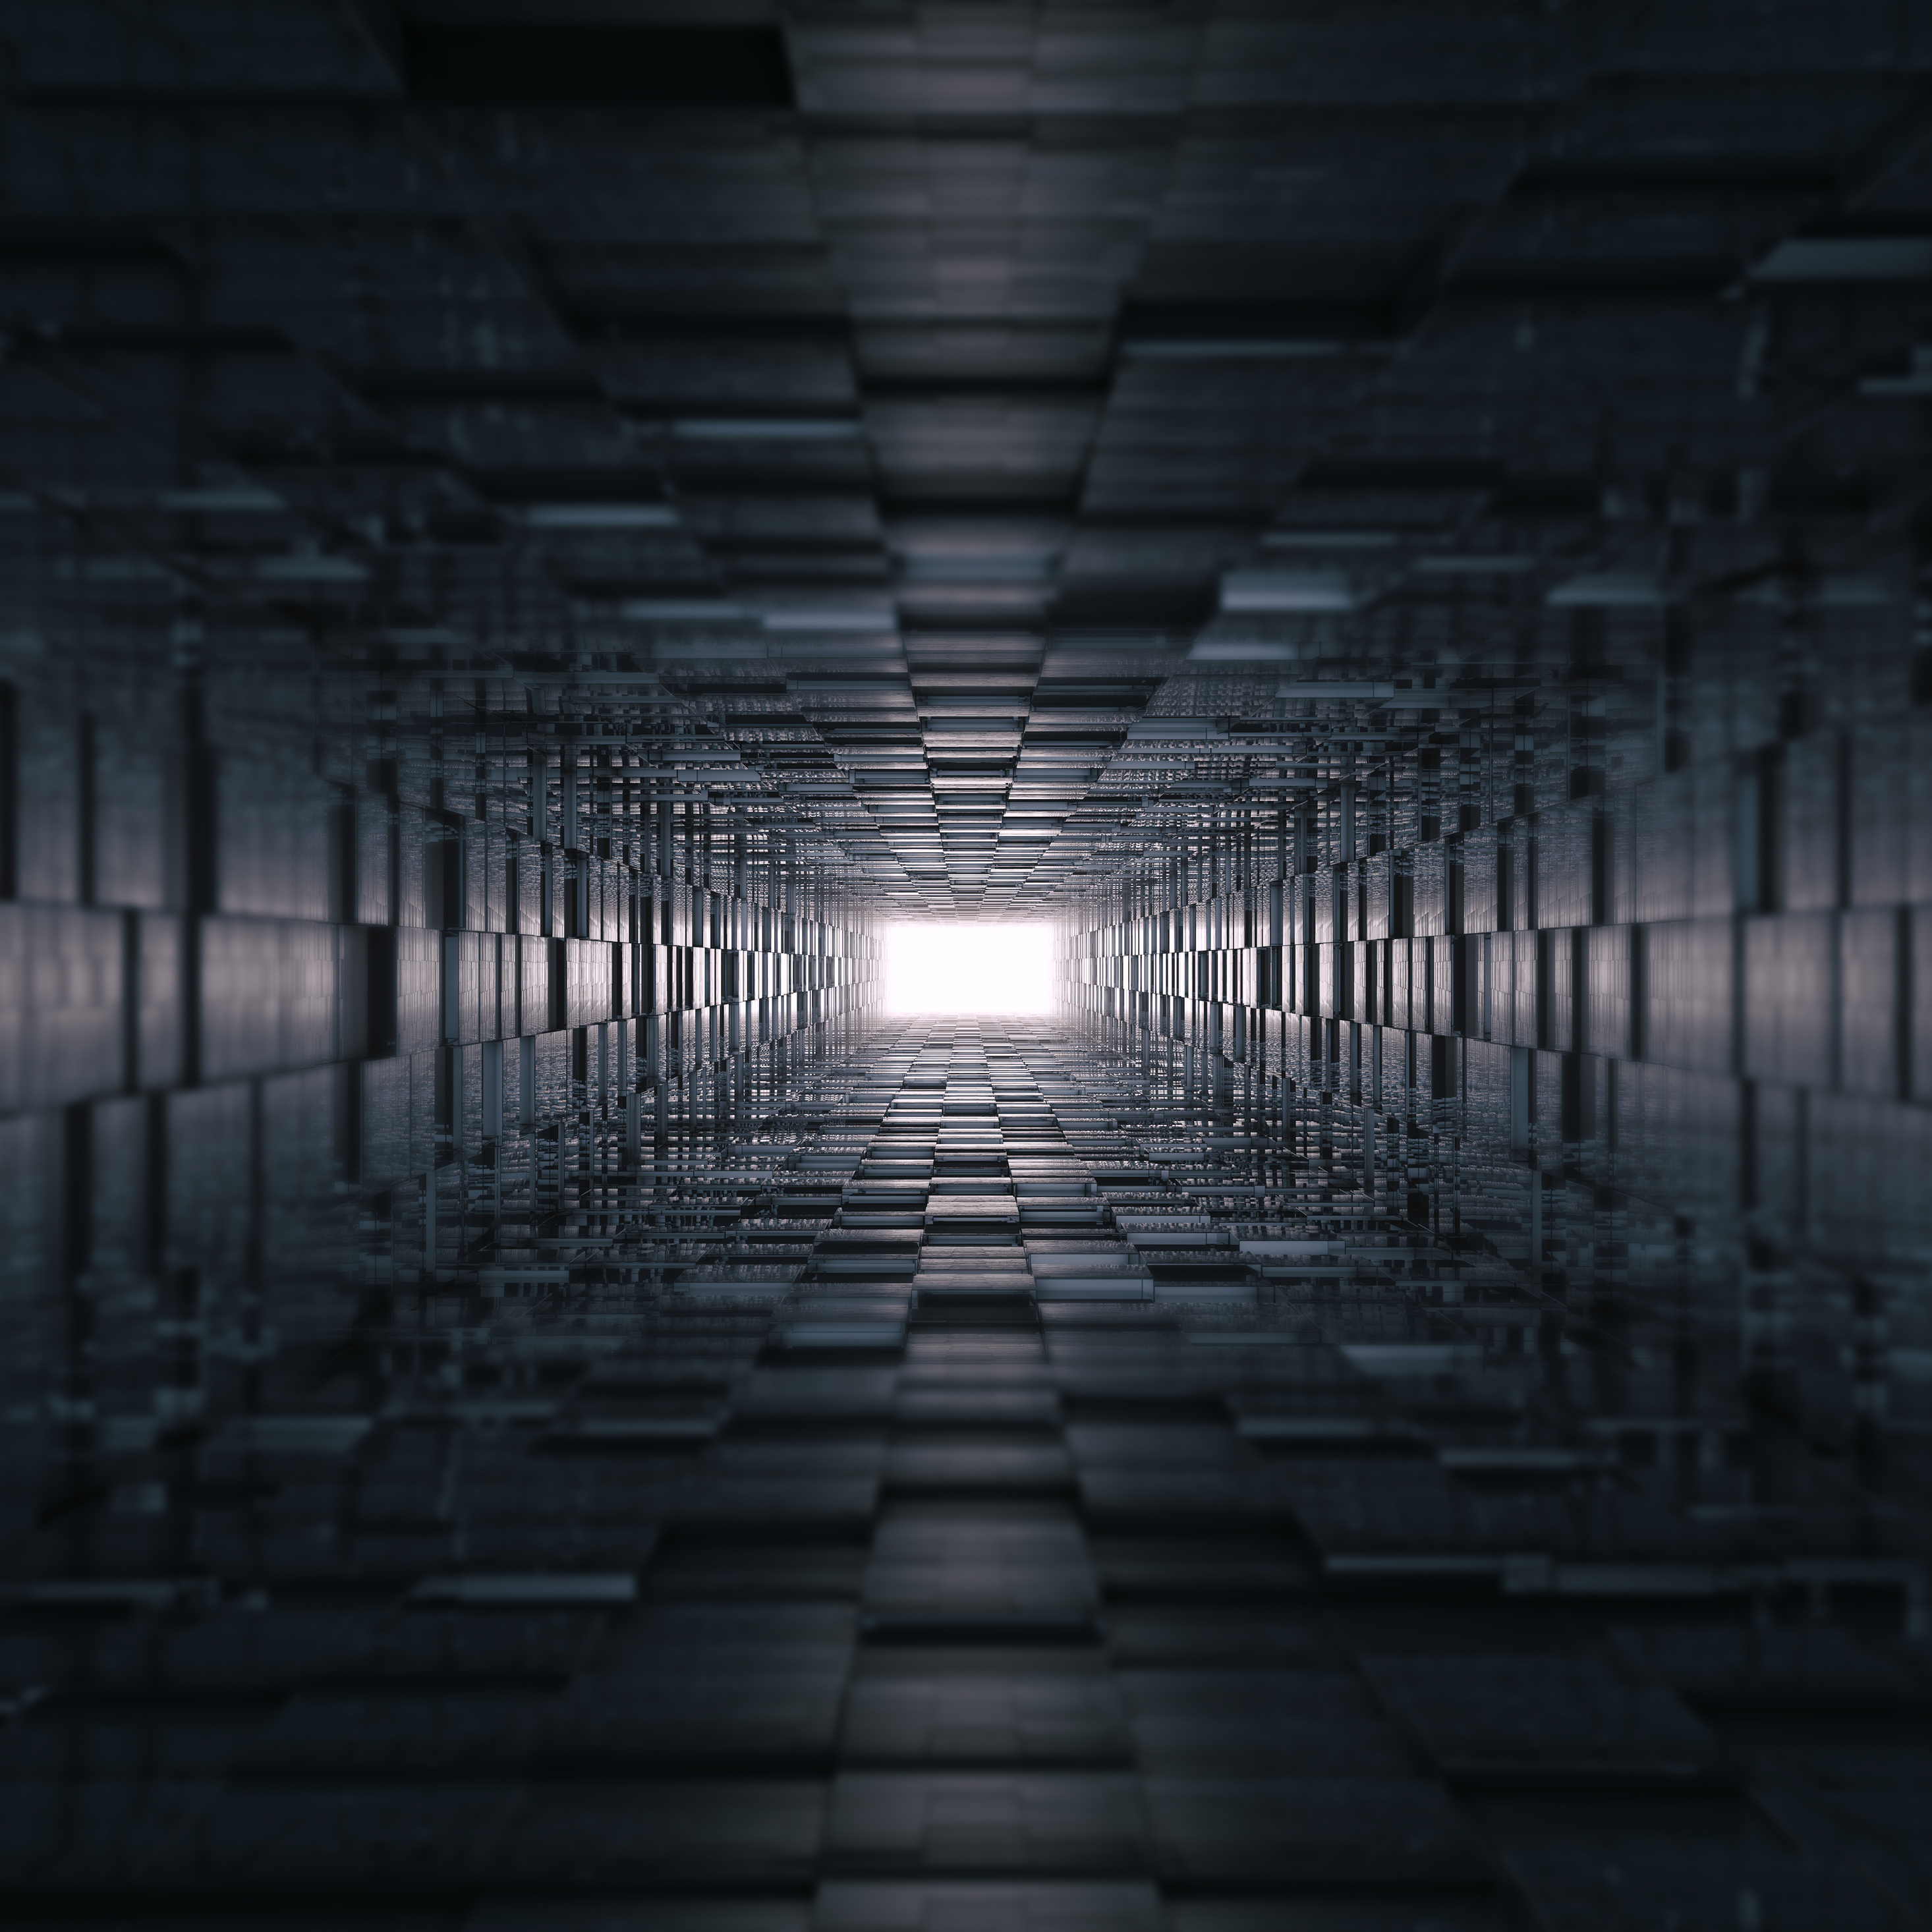 2932x2932 3d Tunnel Abstract 8k Ipad Pro Retina Display HD